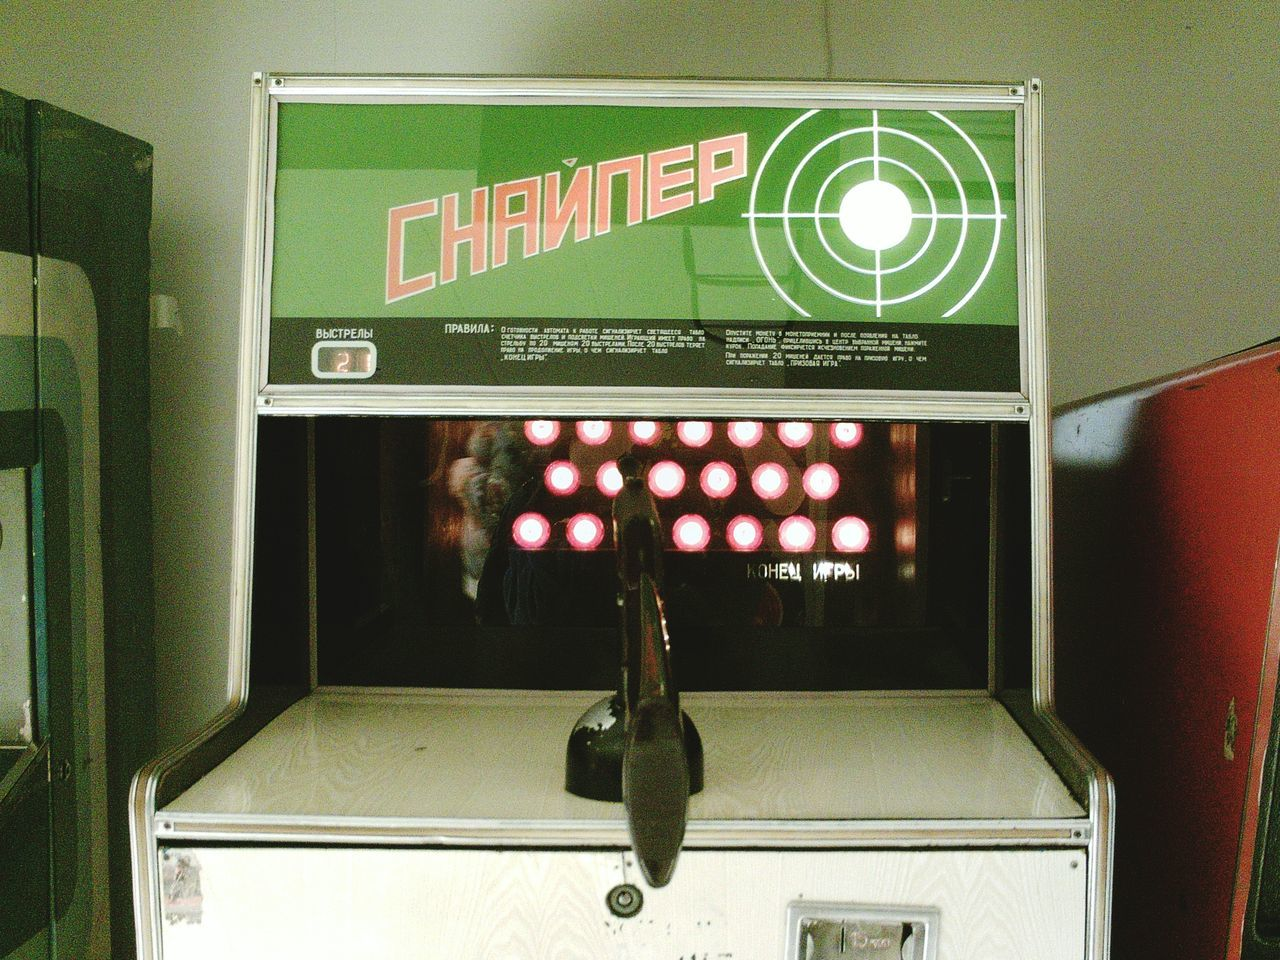 Pachinko Game Arcade Arcade Games Old Arcade Close-up